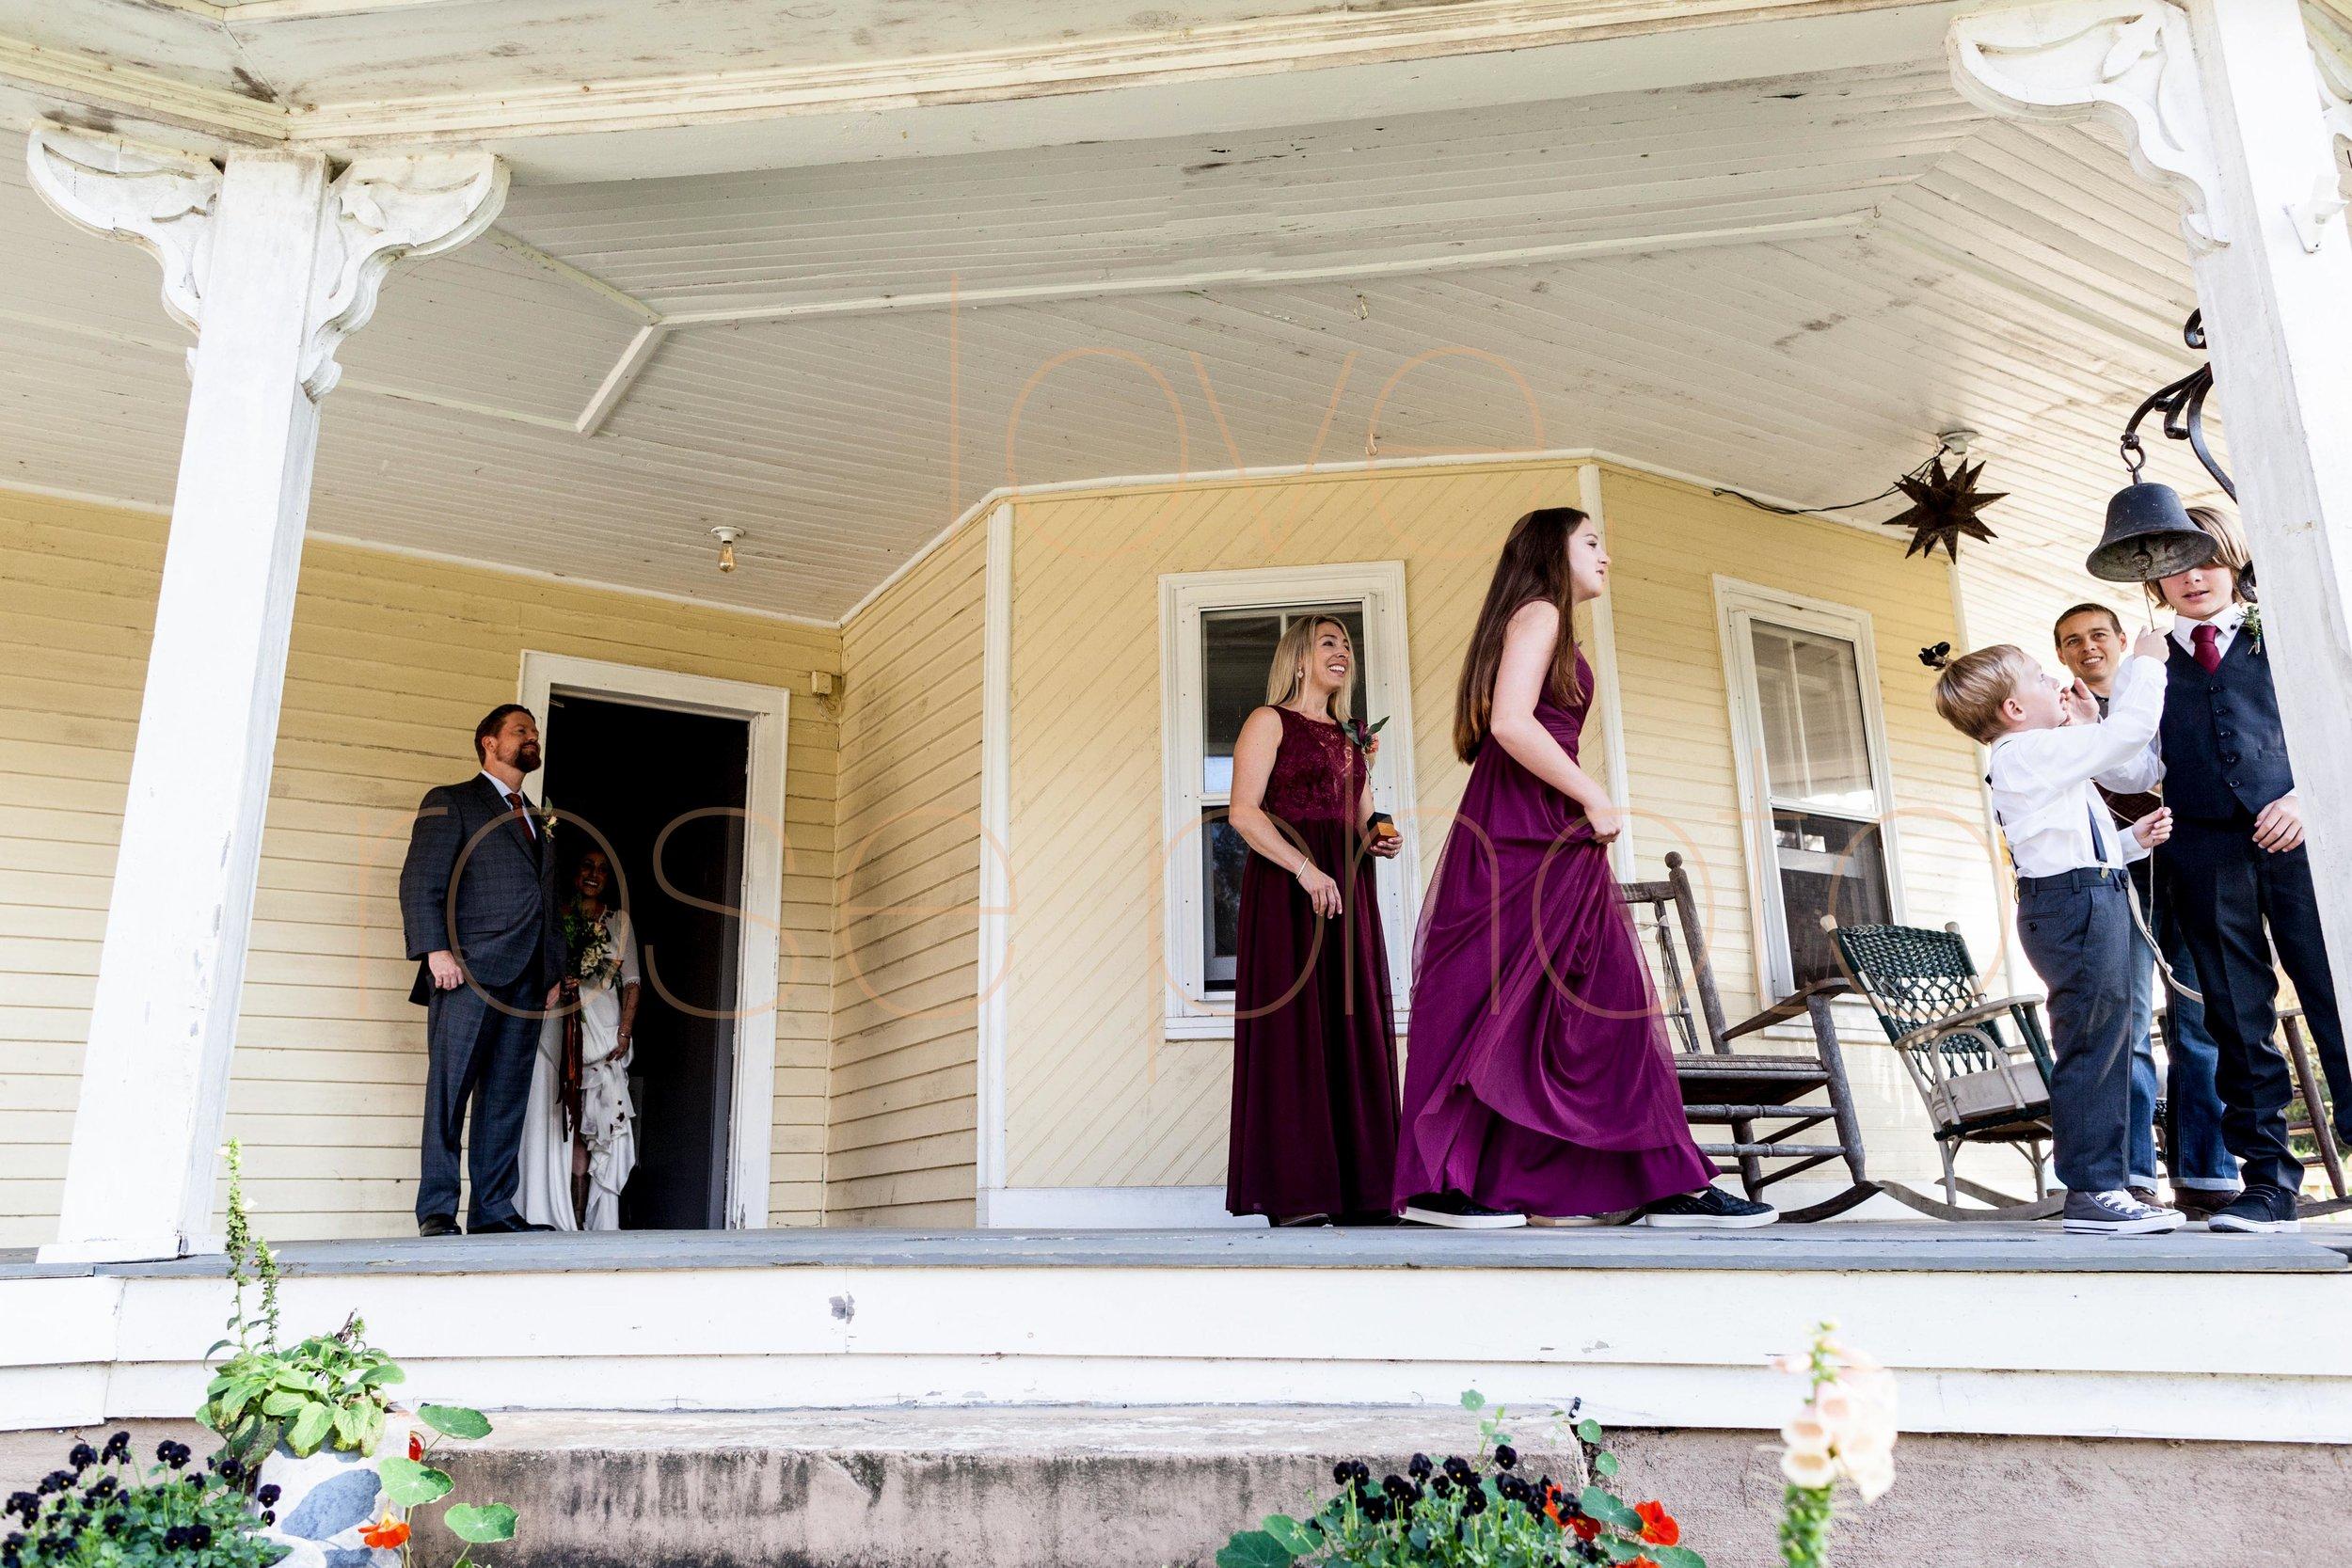 Jane Krame + Jason Ashevegas married asheville best wedding photographers -40.jpg